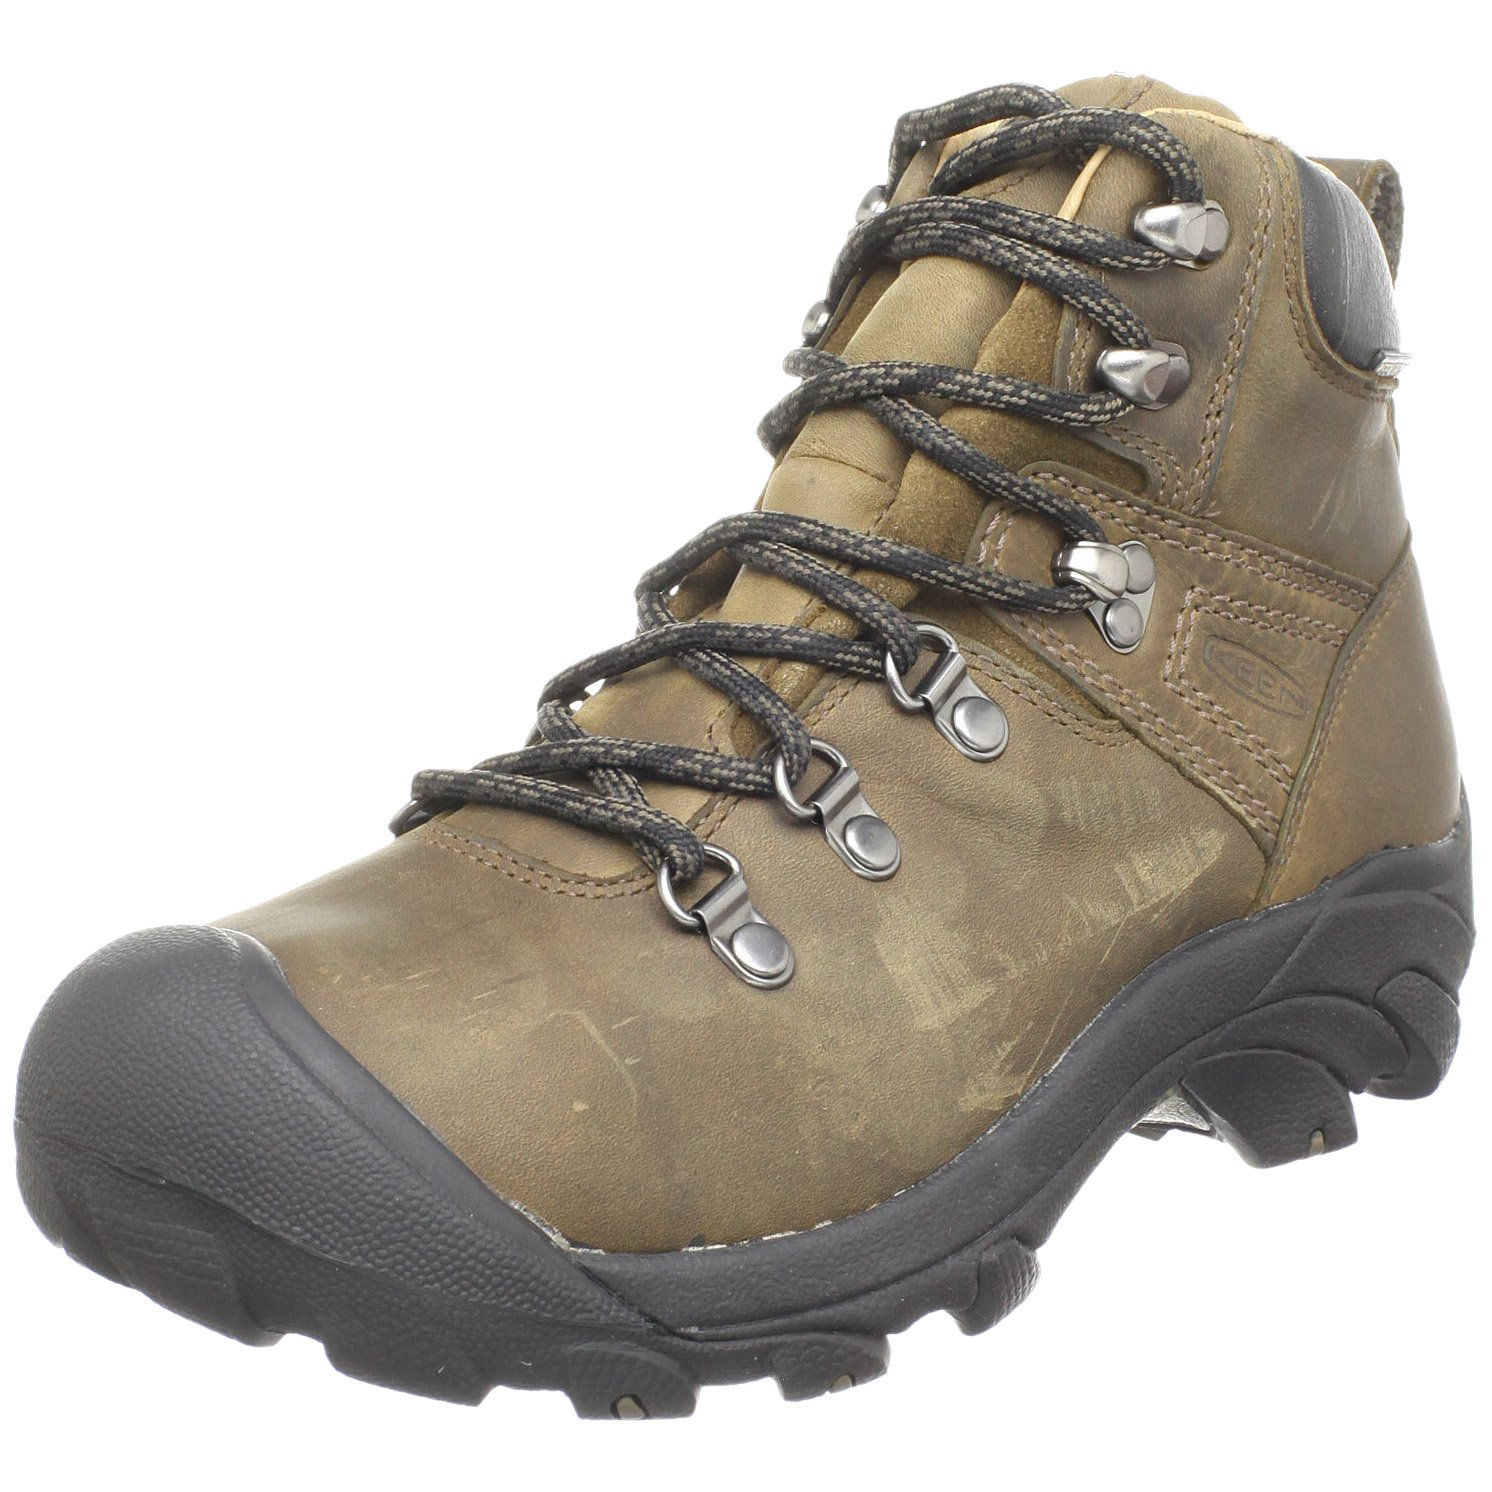 52f26f0a473 KEEN Women's Pyrenees Waterproof Hiking Boot